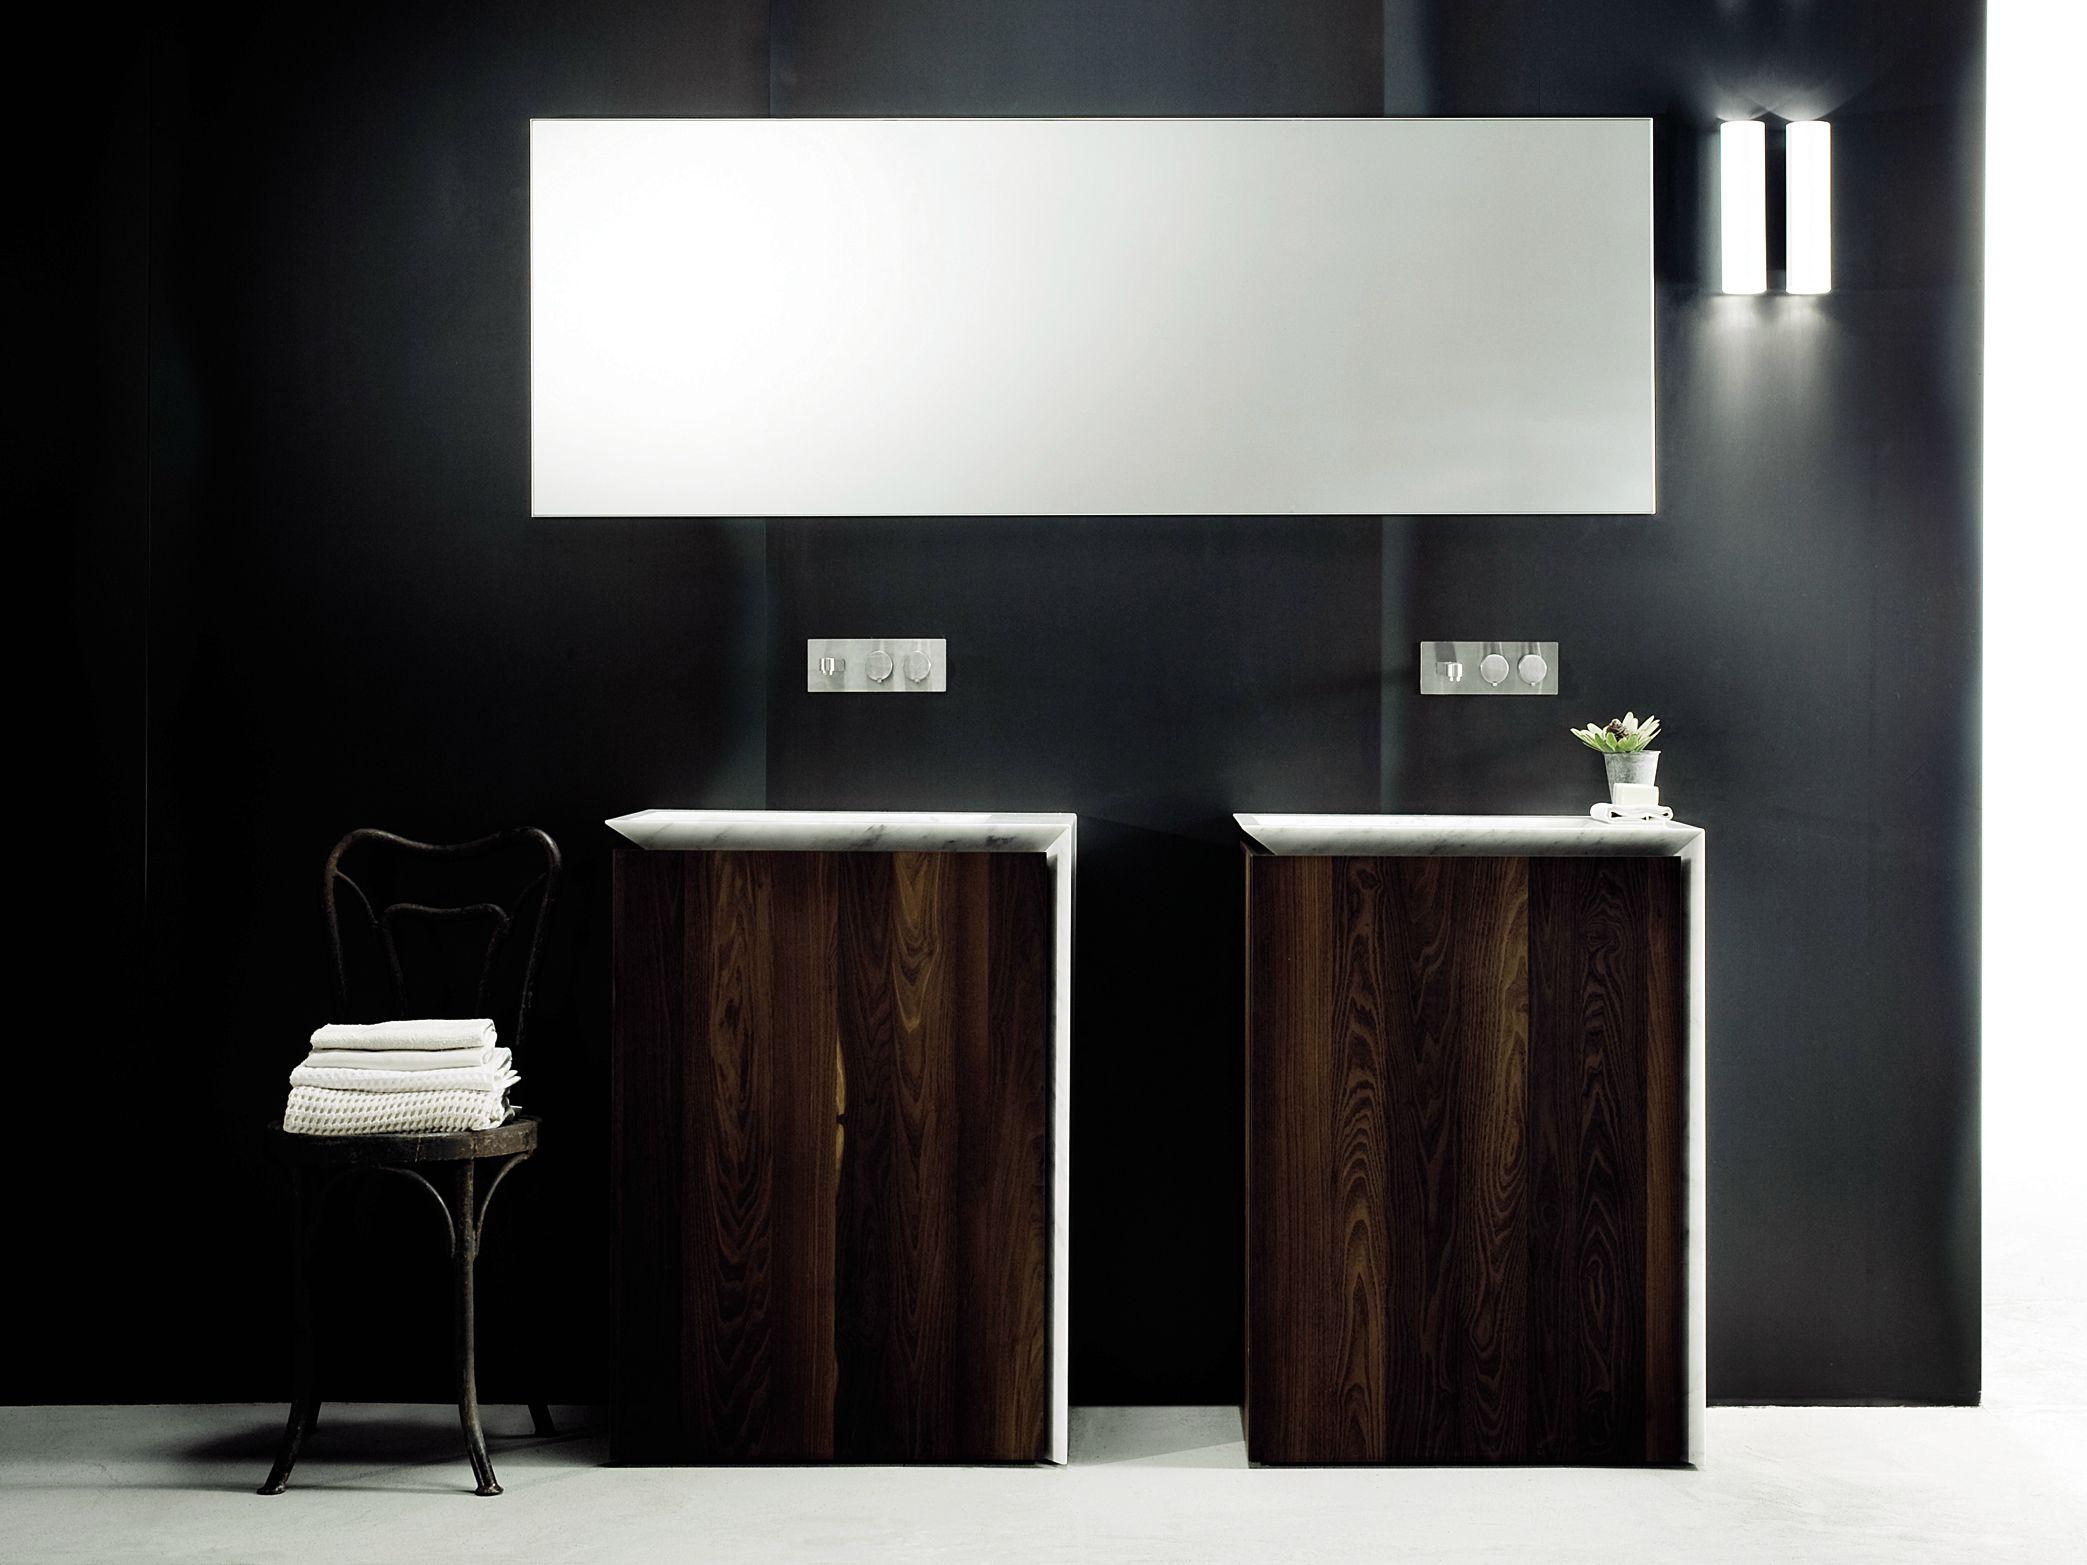 b15 wood veneer vanity unit by boffi design norbert wangen. Black Bedroom Furniture Sets. Home Design Ideas